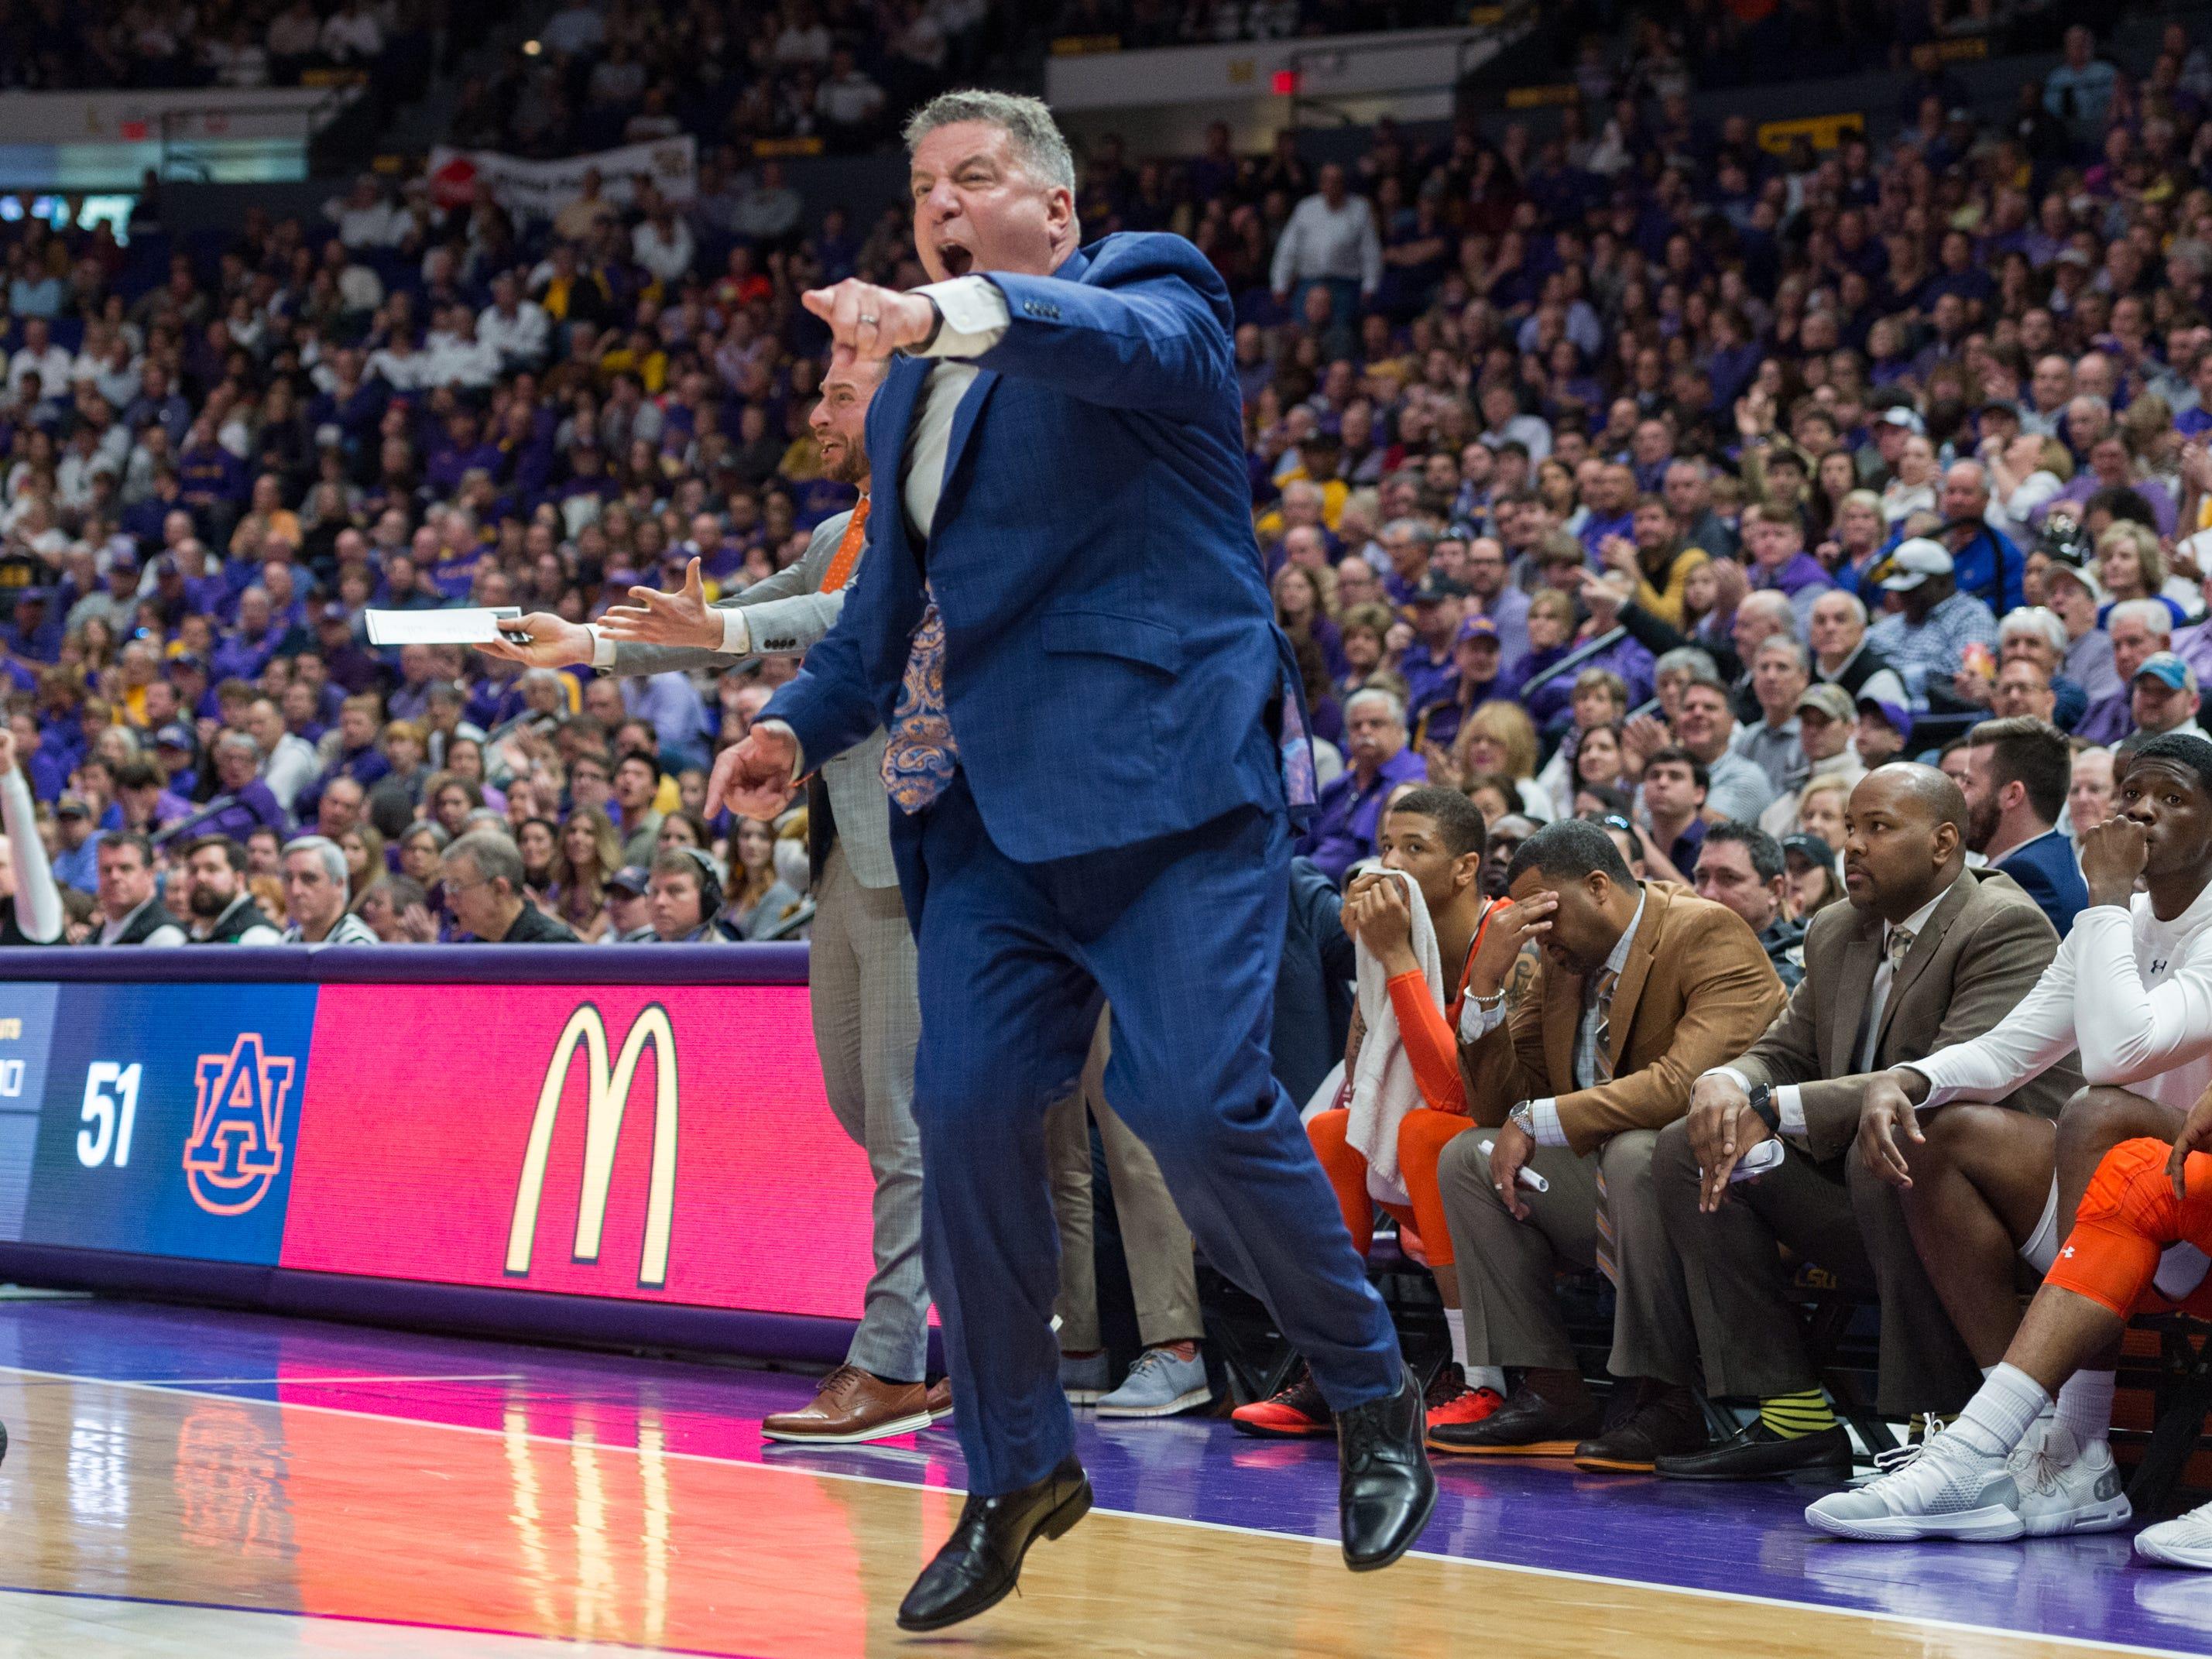 Auburn head coach Bruce Pearl as the LSU Tigers take down the Auburn Tigers 83-78. Saturday, Feb. 9, 2019.